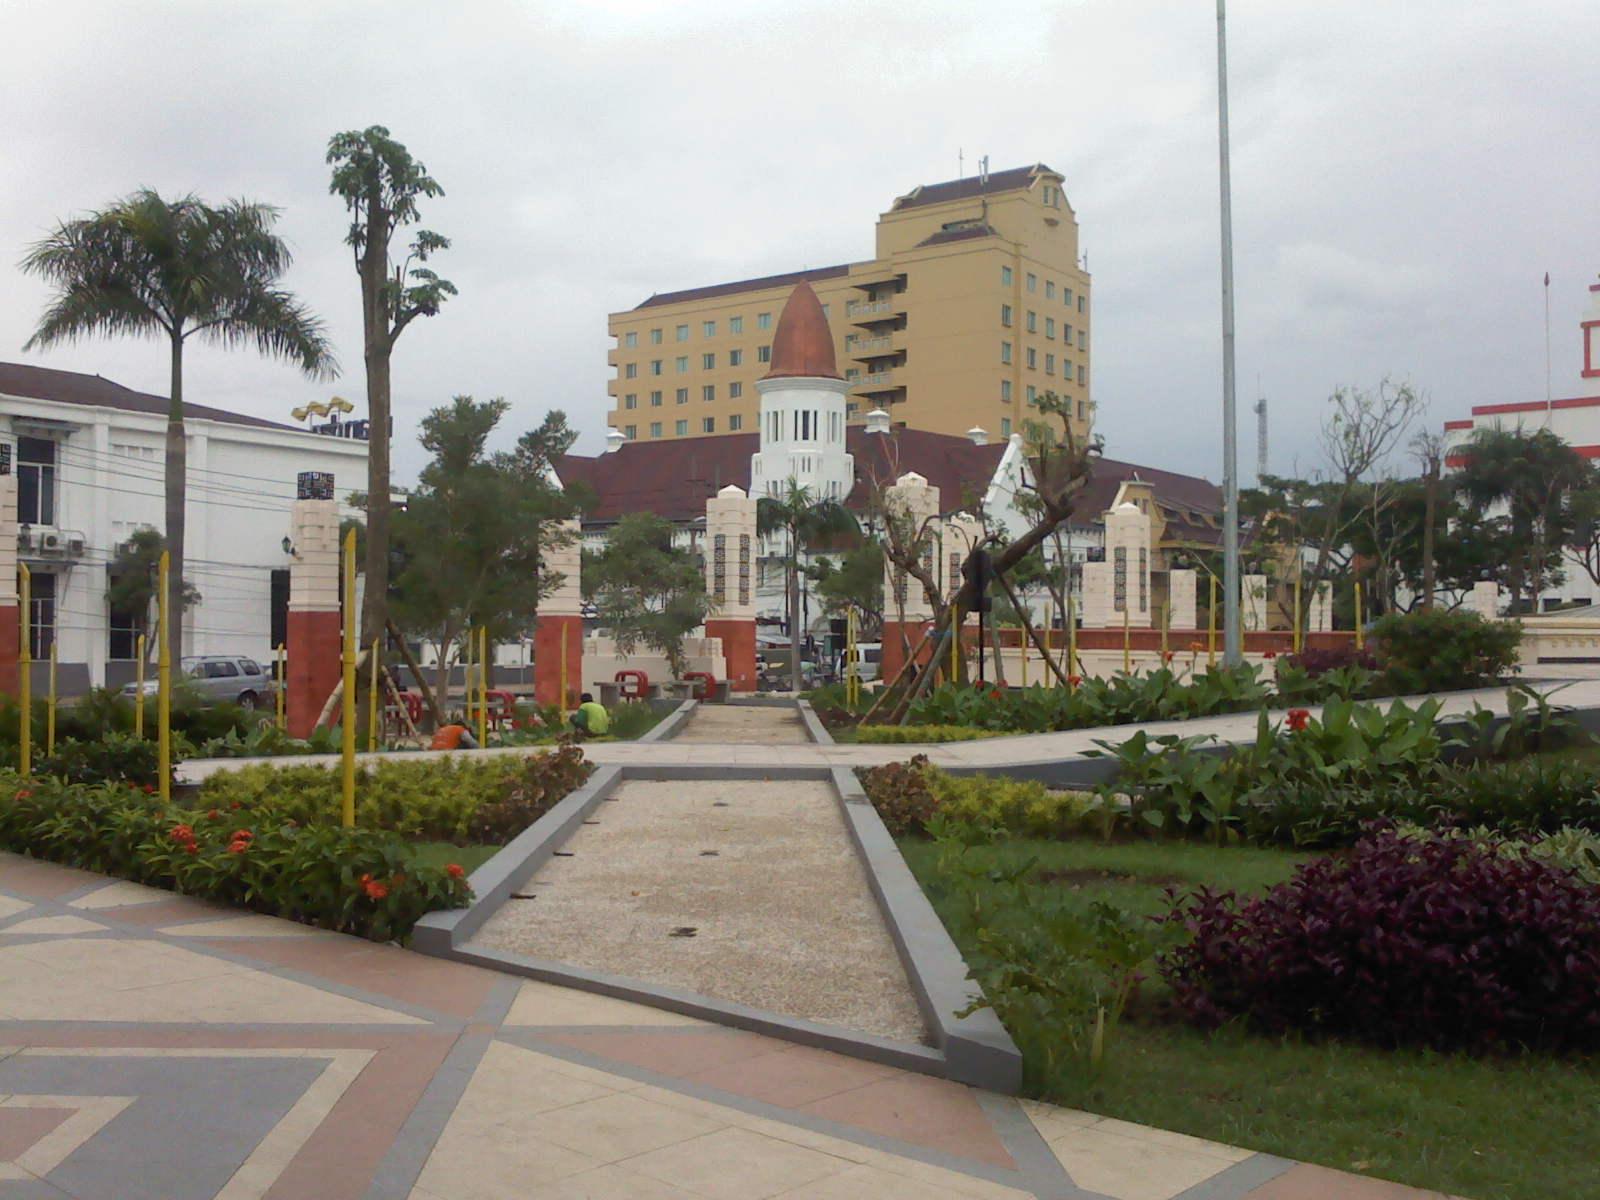 Monumen Bambu Runcing Pesona Taman Kota Surabaya Wisata